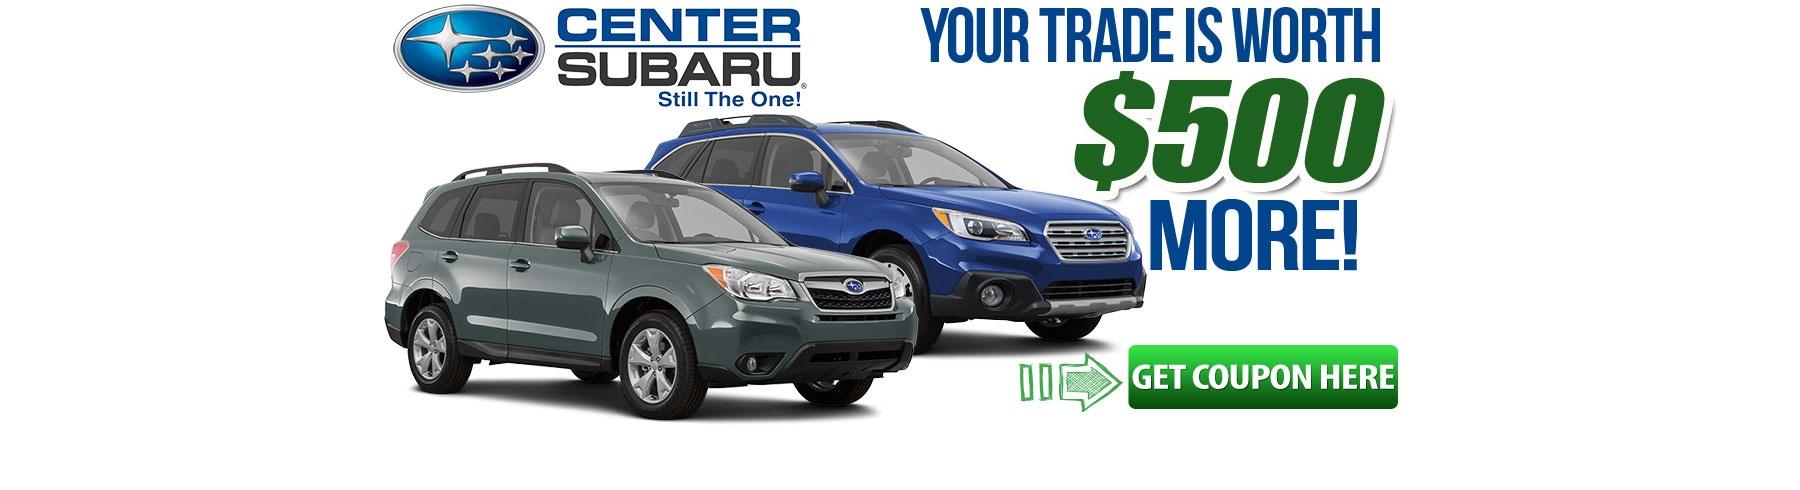 Subaru Dealers In Ct >> Center Subaru Ct New Used Car Dealer Serving Torrington Canton